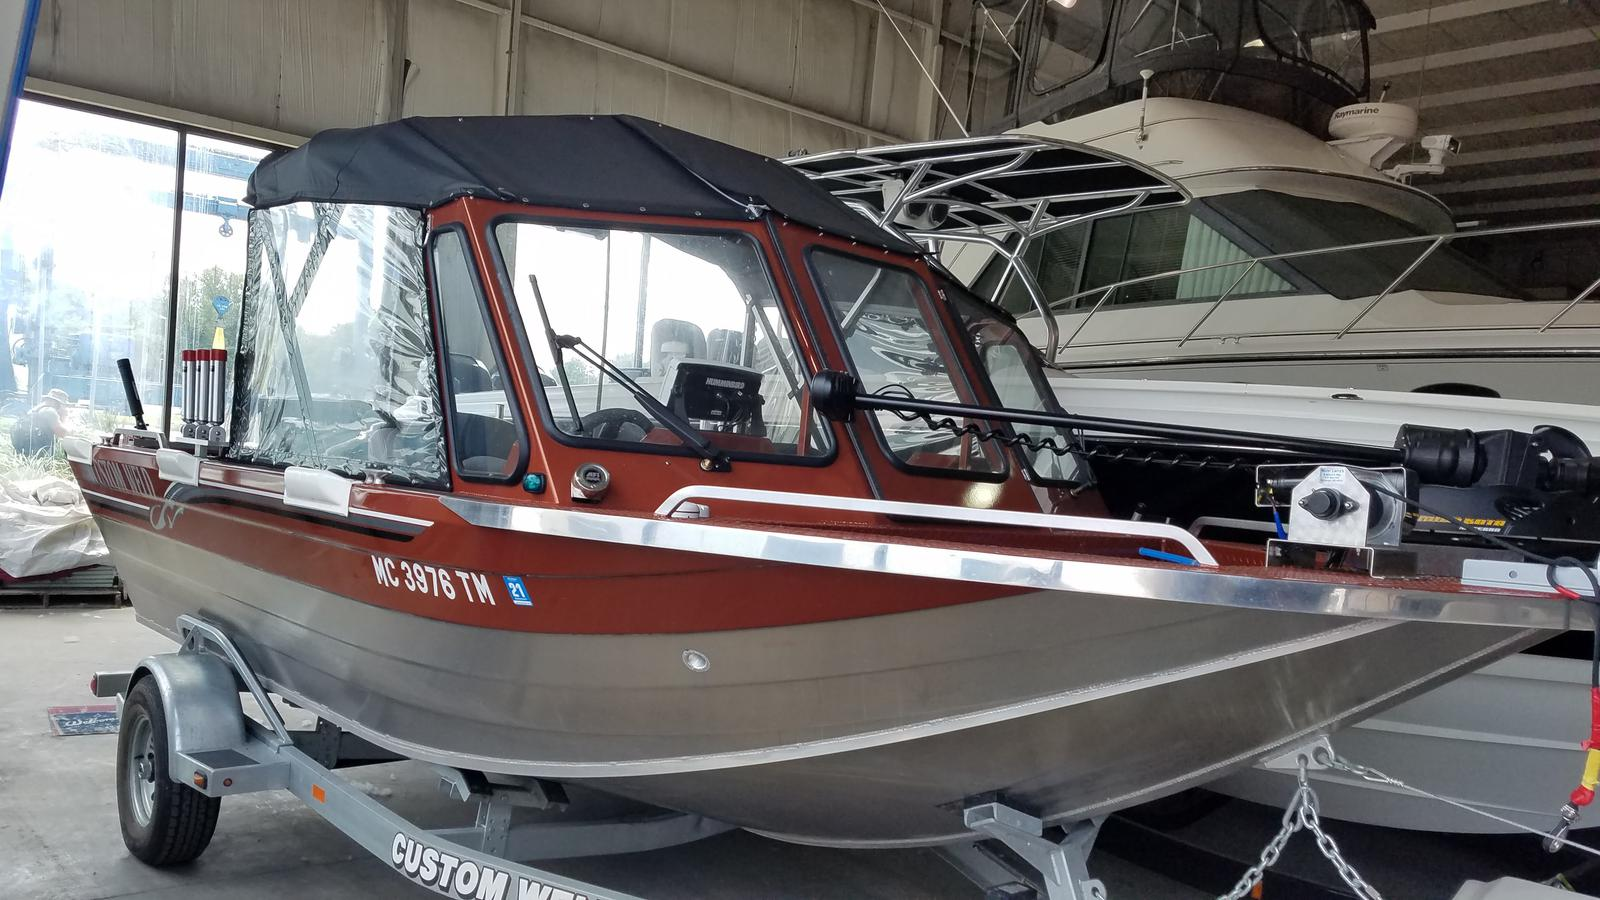 2013 Custom Weld Recreational Boat 19 Viper Series For Sale In 3976 Fuel Filter Benton Harbor Mi Pier 1000 Marina 888 616 1679